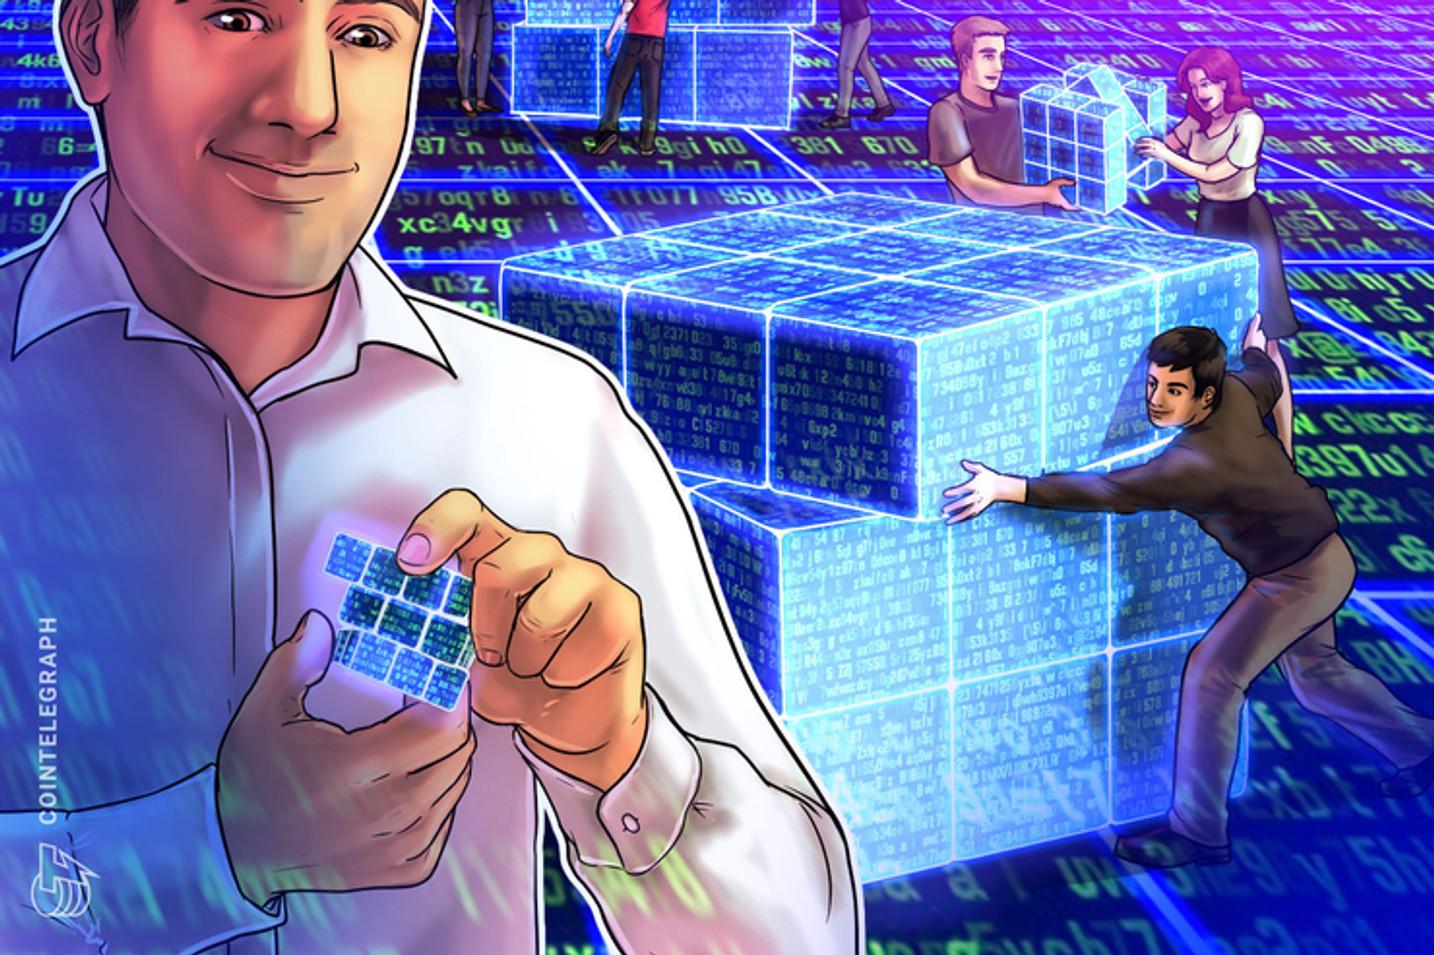 La dificultad de Bitcoin Cash luce volátil antes del Hard Fork del 15 de noviembre